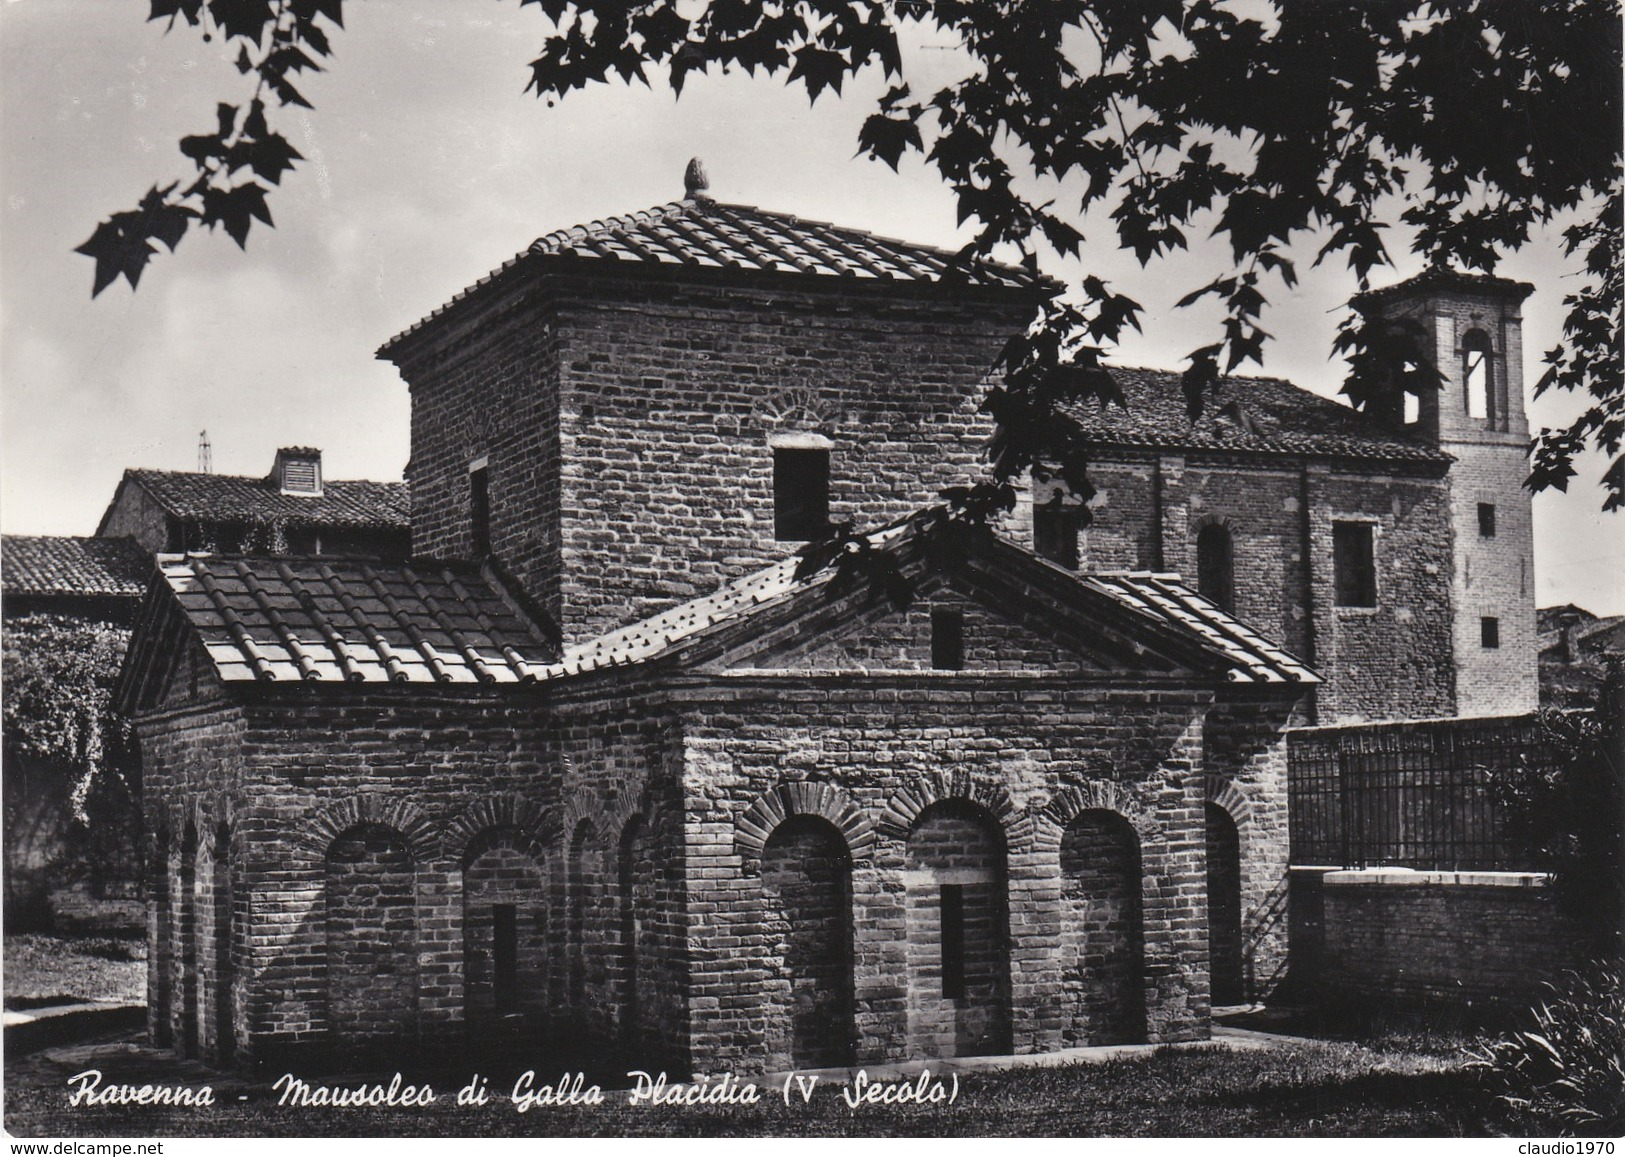 CARTOLINA - POSTCARD - RAVENNA - MAUSOLEO DI GALLA PLACIDIA - V SECOLO - Ravenna